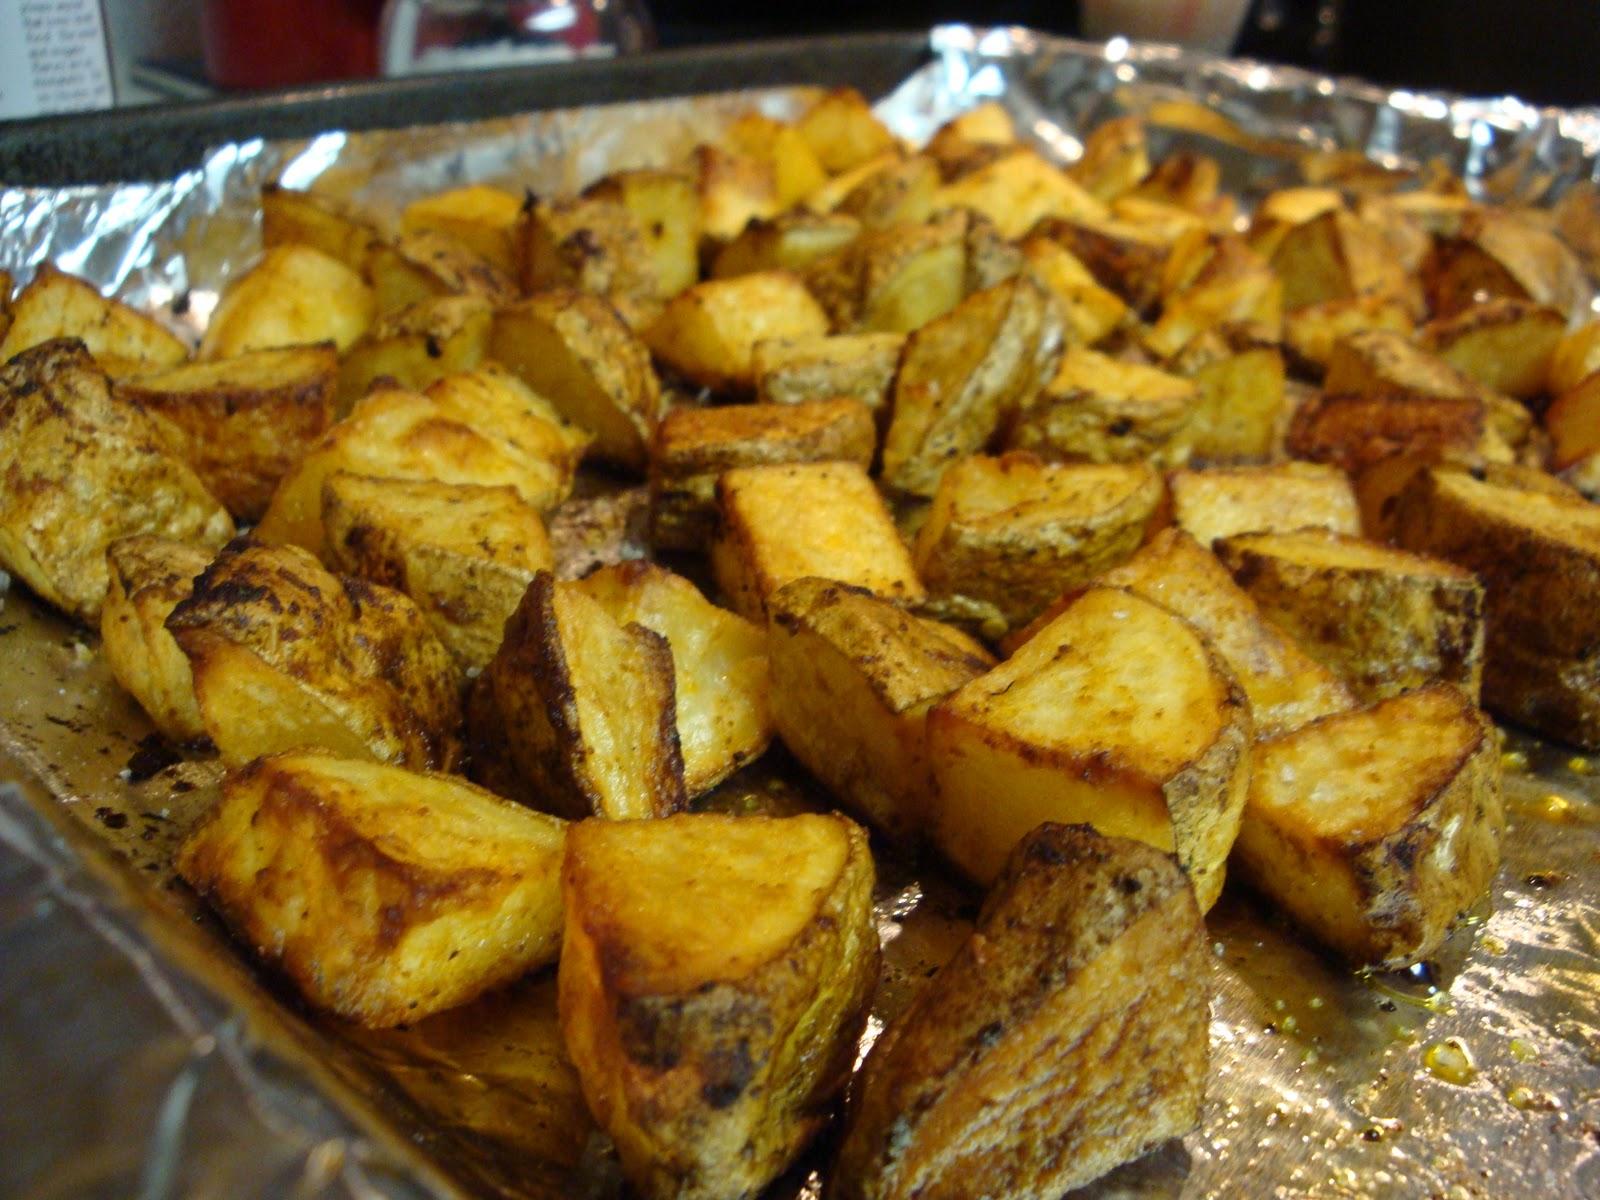 oven roasted smoked sweet paprika potatoes 2 pounds of russet potatoes ...